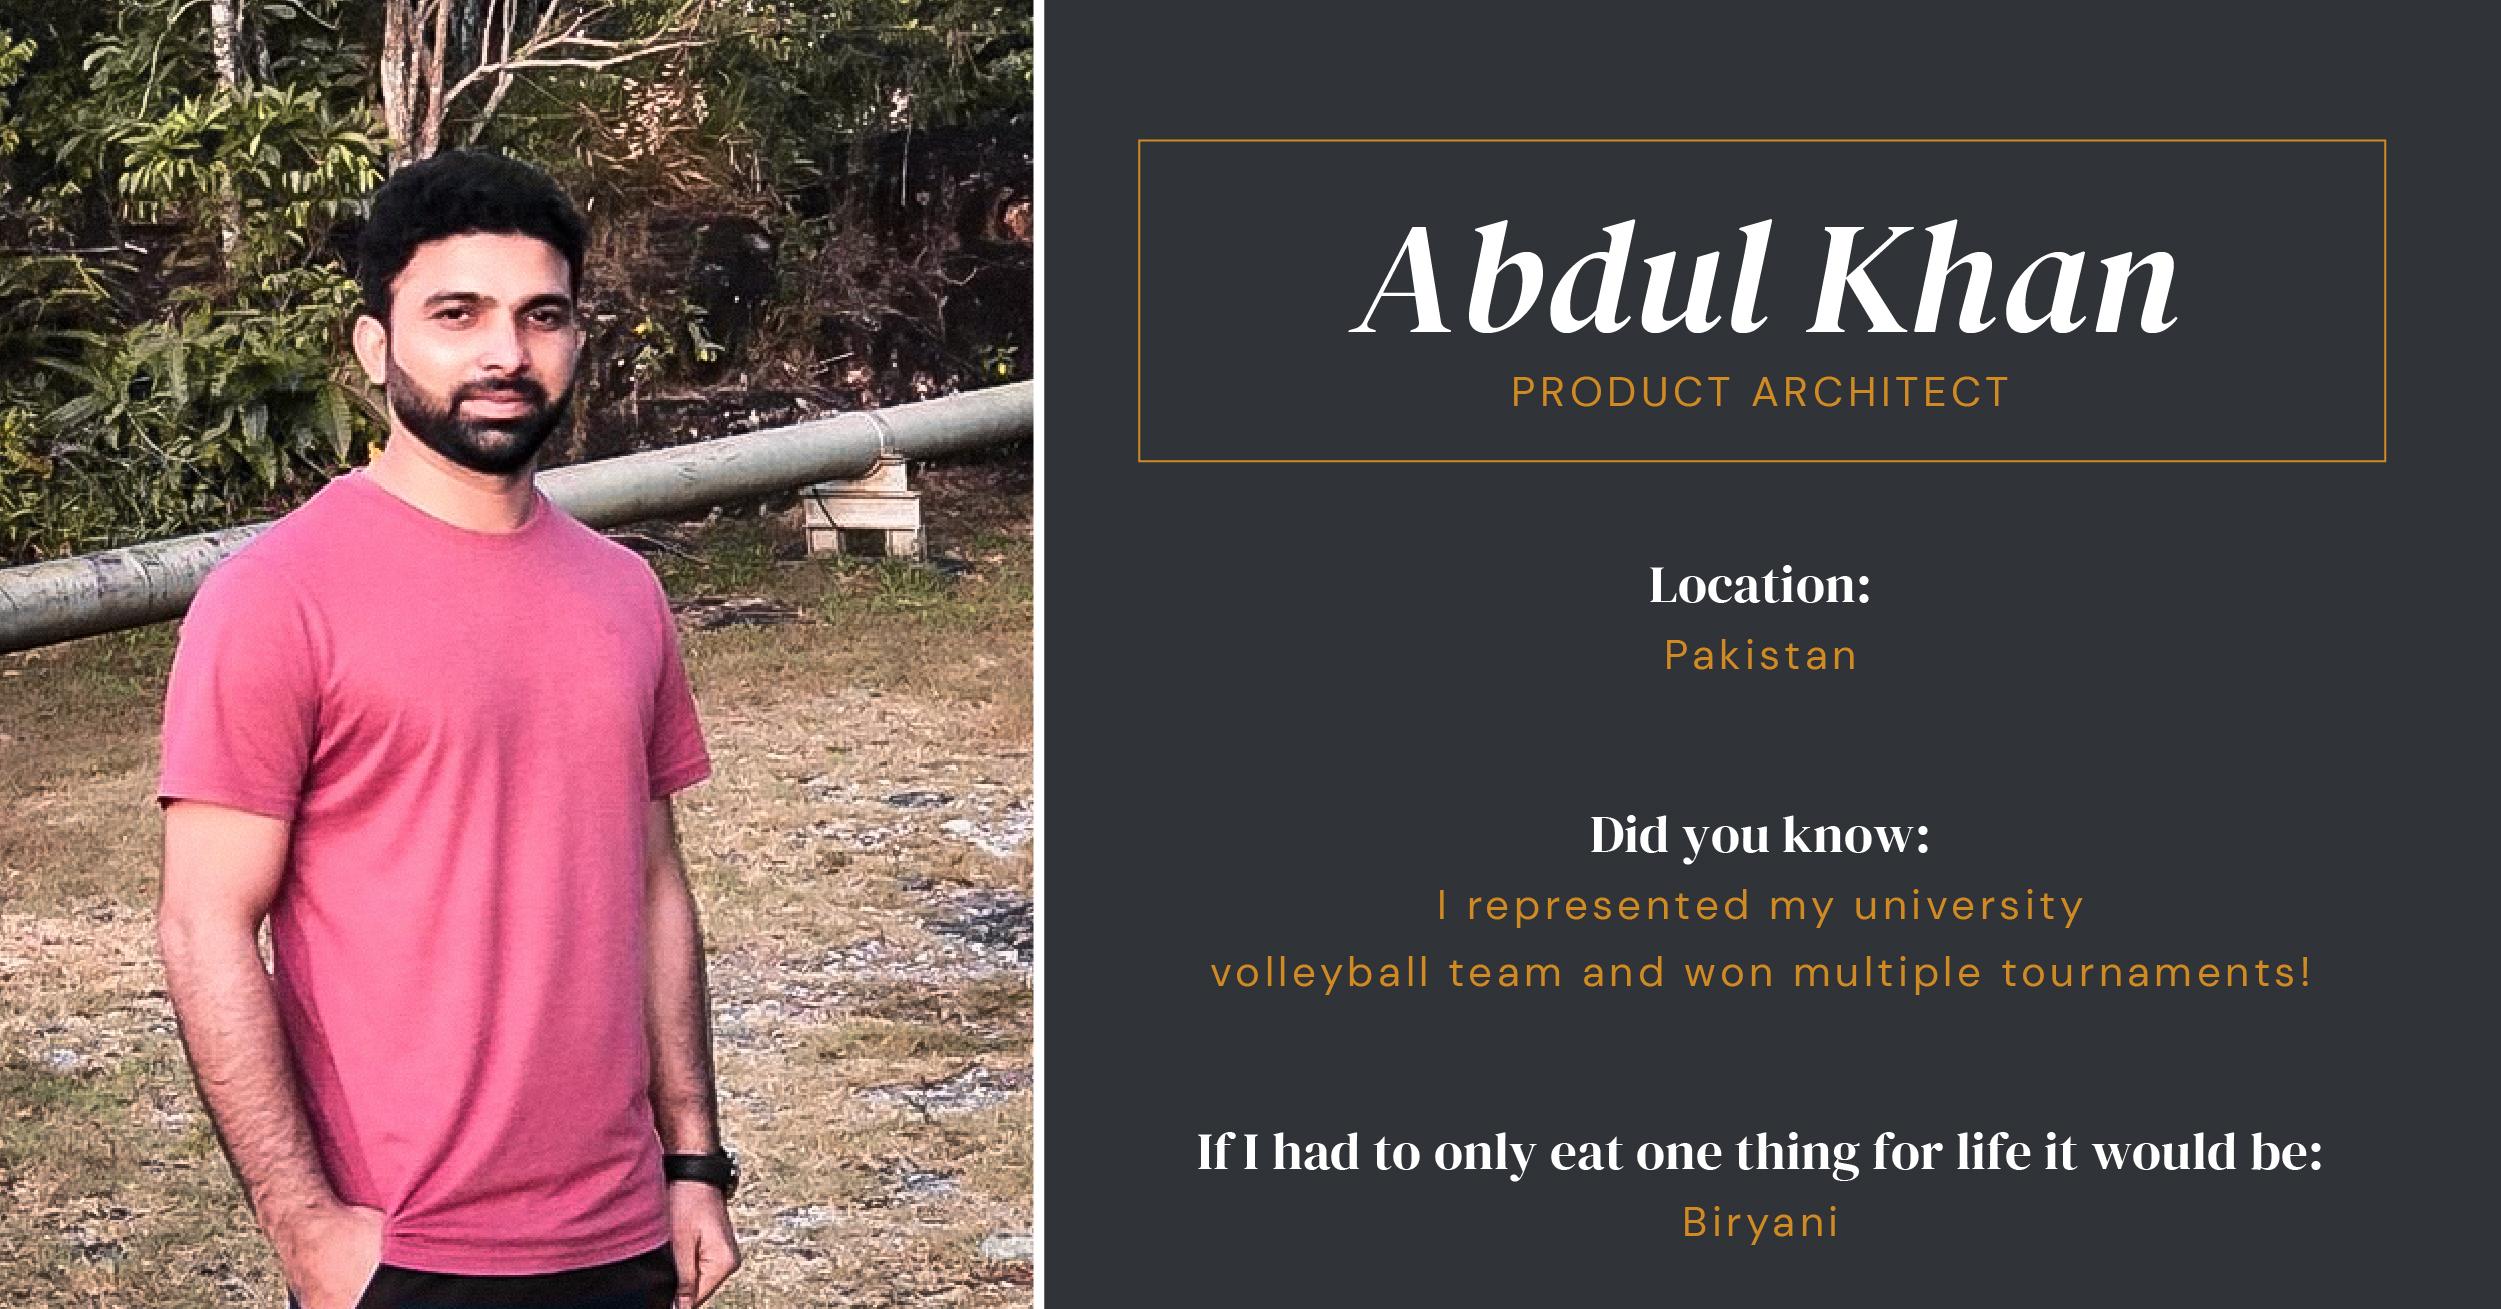 Abdul Khan Product Architect